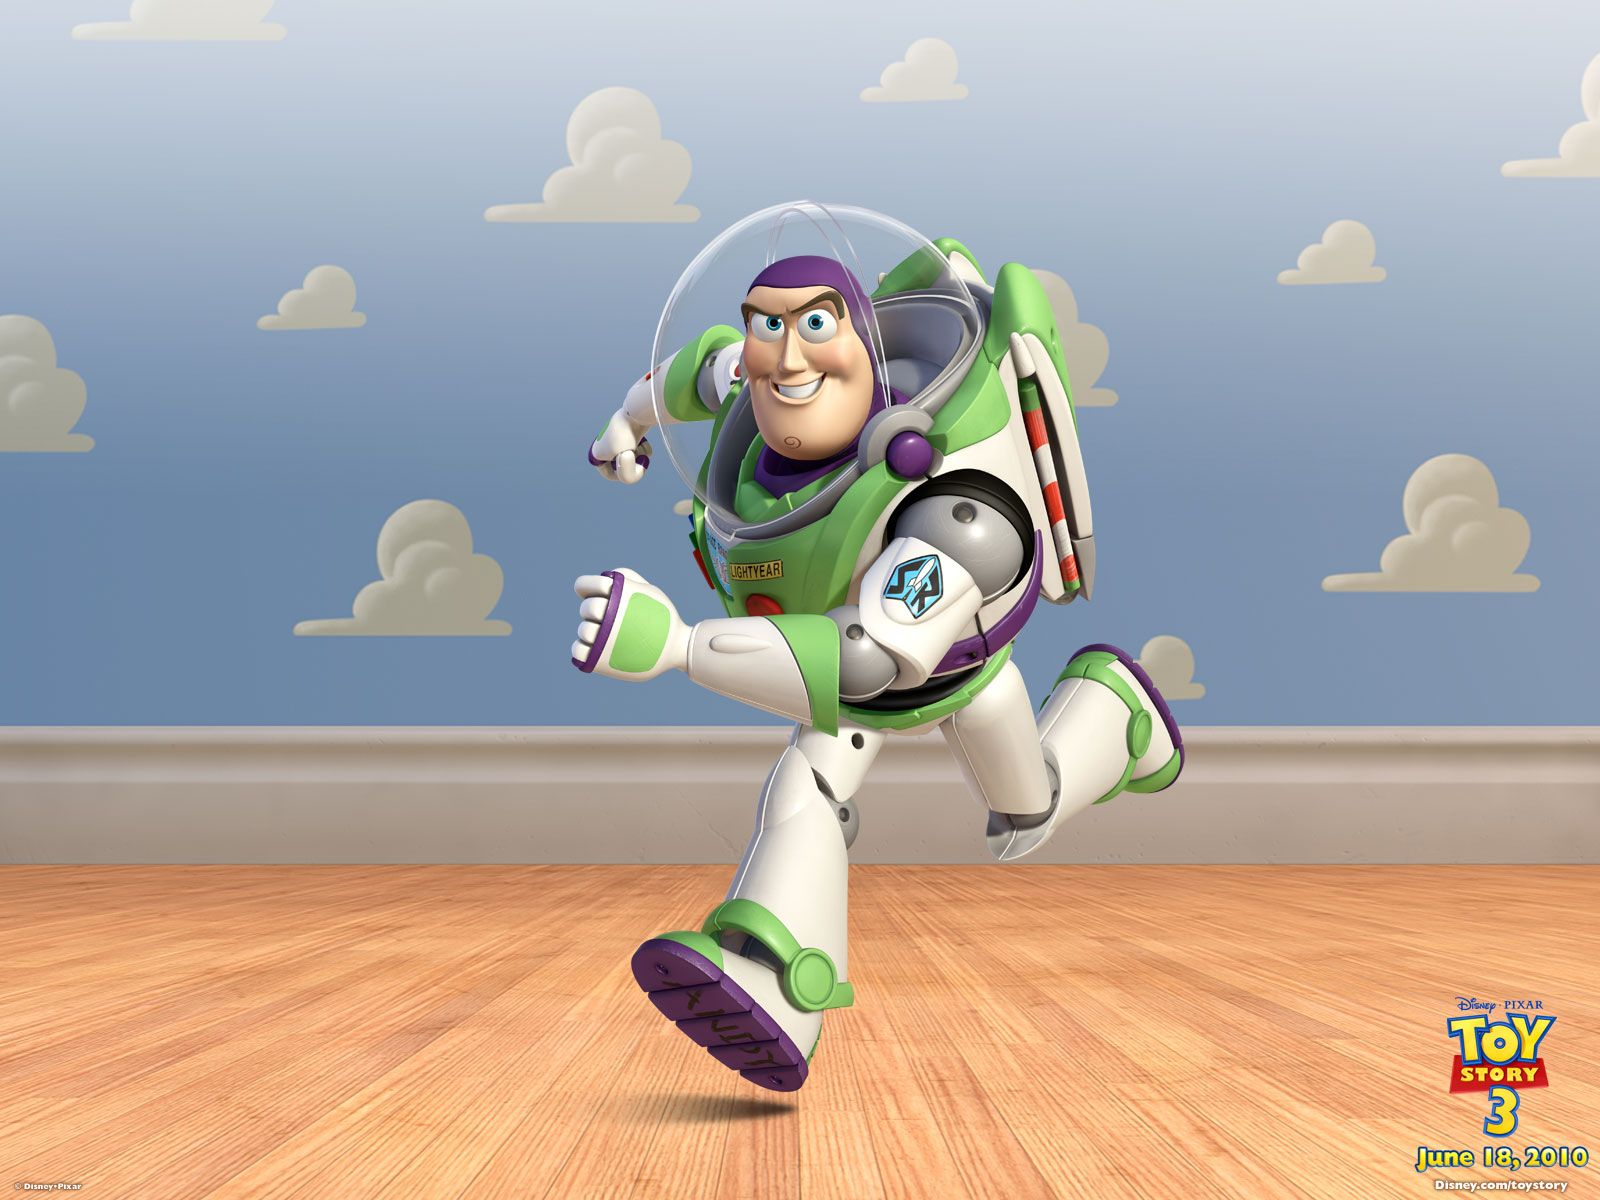 Toy story of terror 1 2 3 buzz lightyear of star command for sale - Buzz Lightyear In Toy Story 3 This Hd Buzz Lightyear In Toy Story 3 Wallpaper